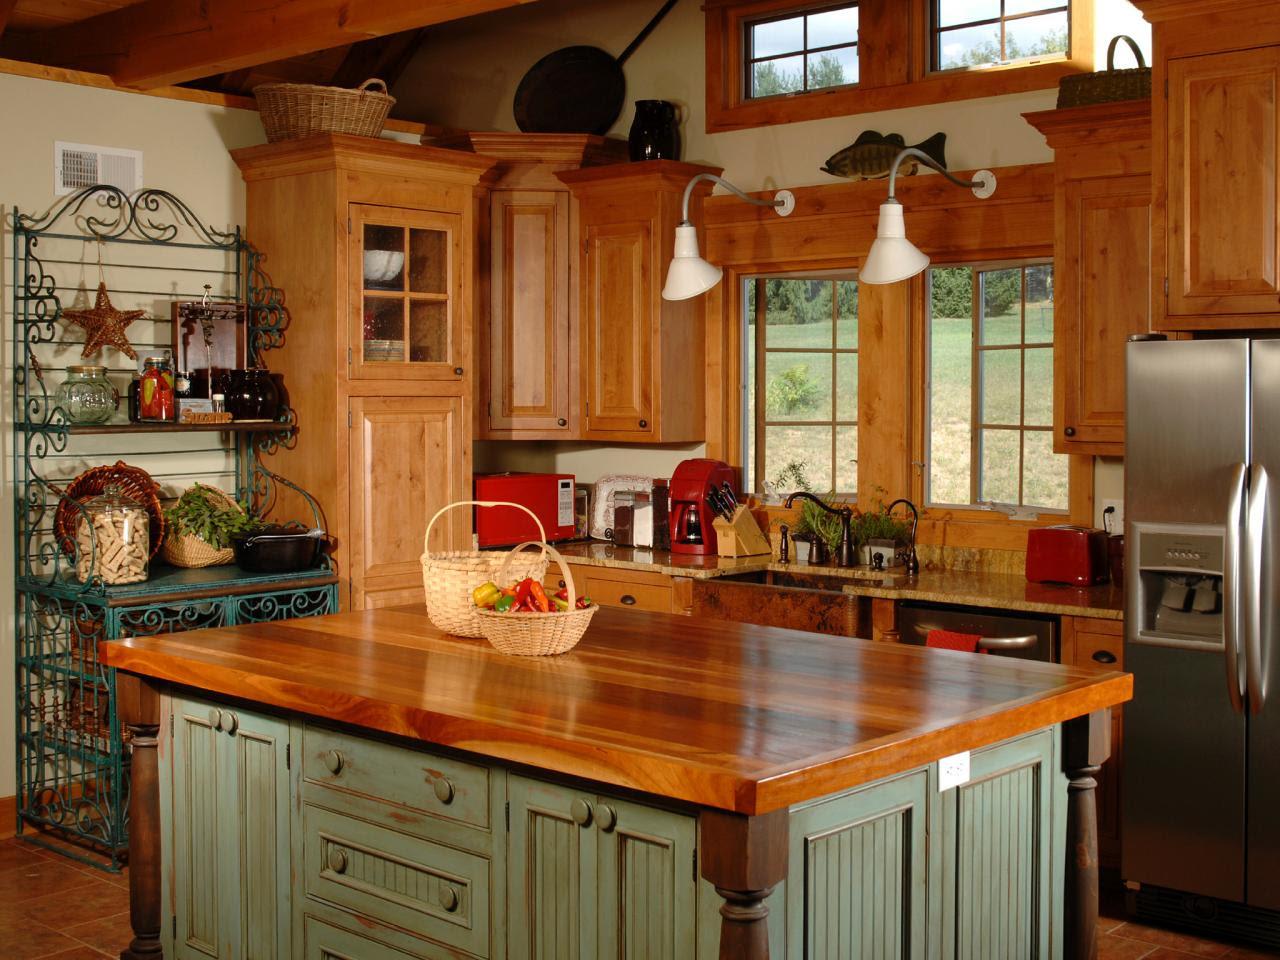 Kitchen Island Countertop Considerations | Kitchen Designs ...